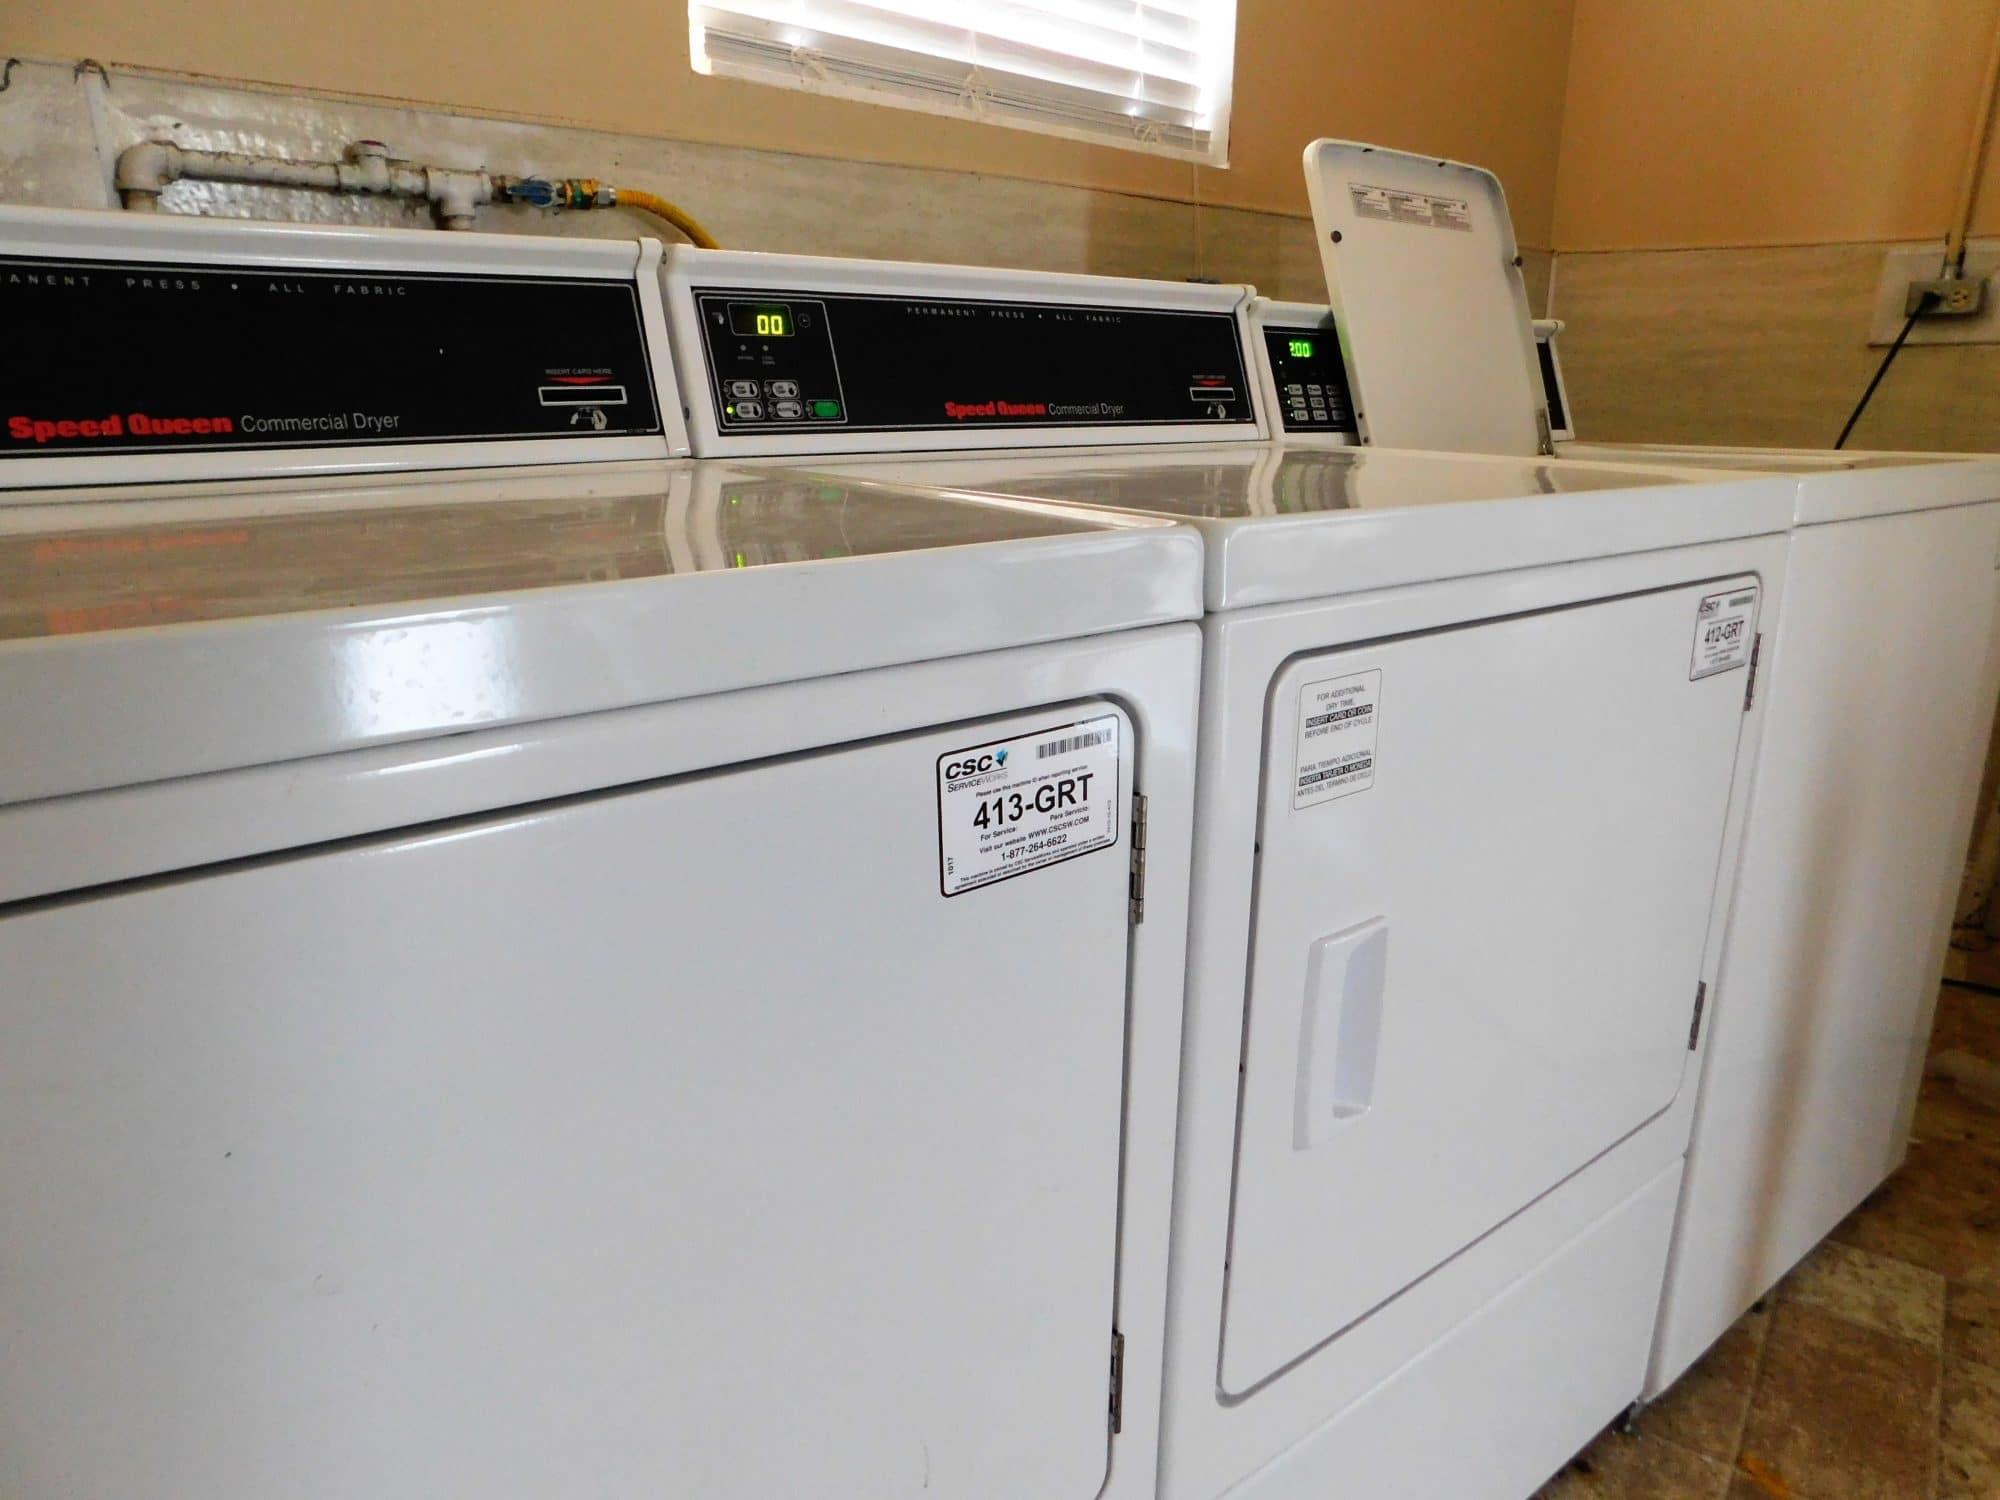 ANS Guest Laundry